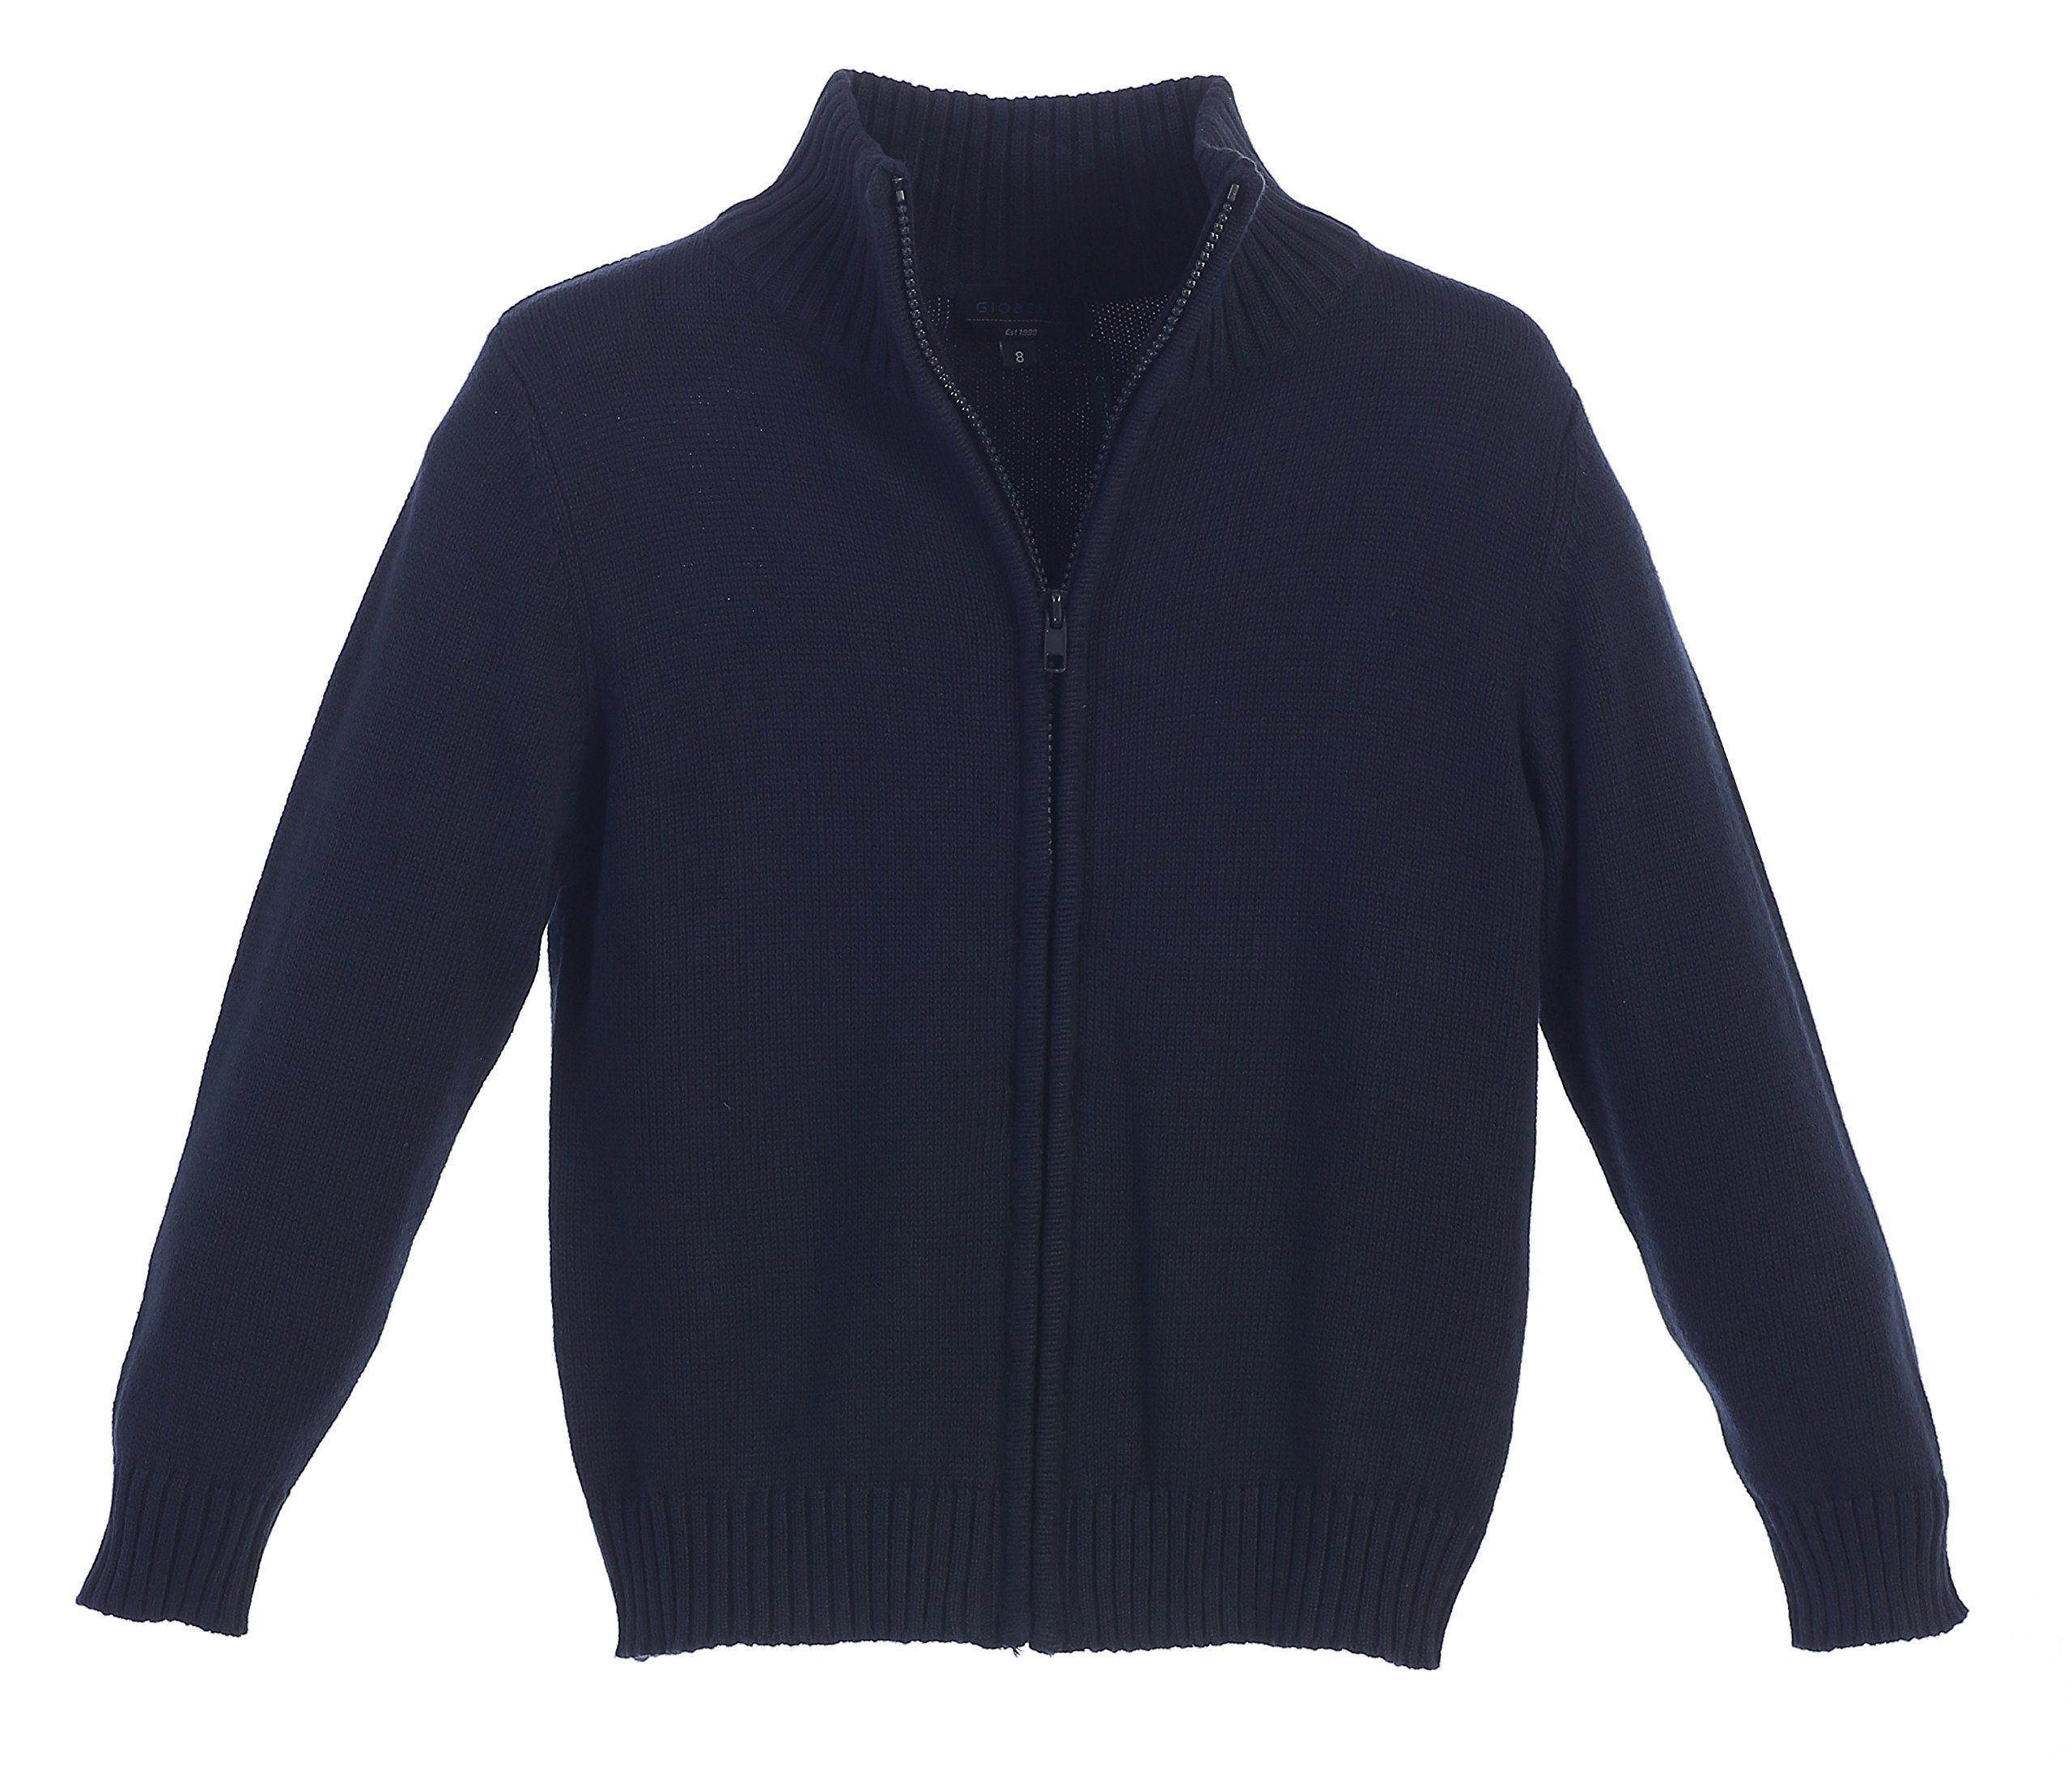 Gioberti Boy's Knitted Full Zip 100% Cotton Cardigan Sweater, Navy, Size 7